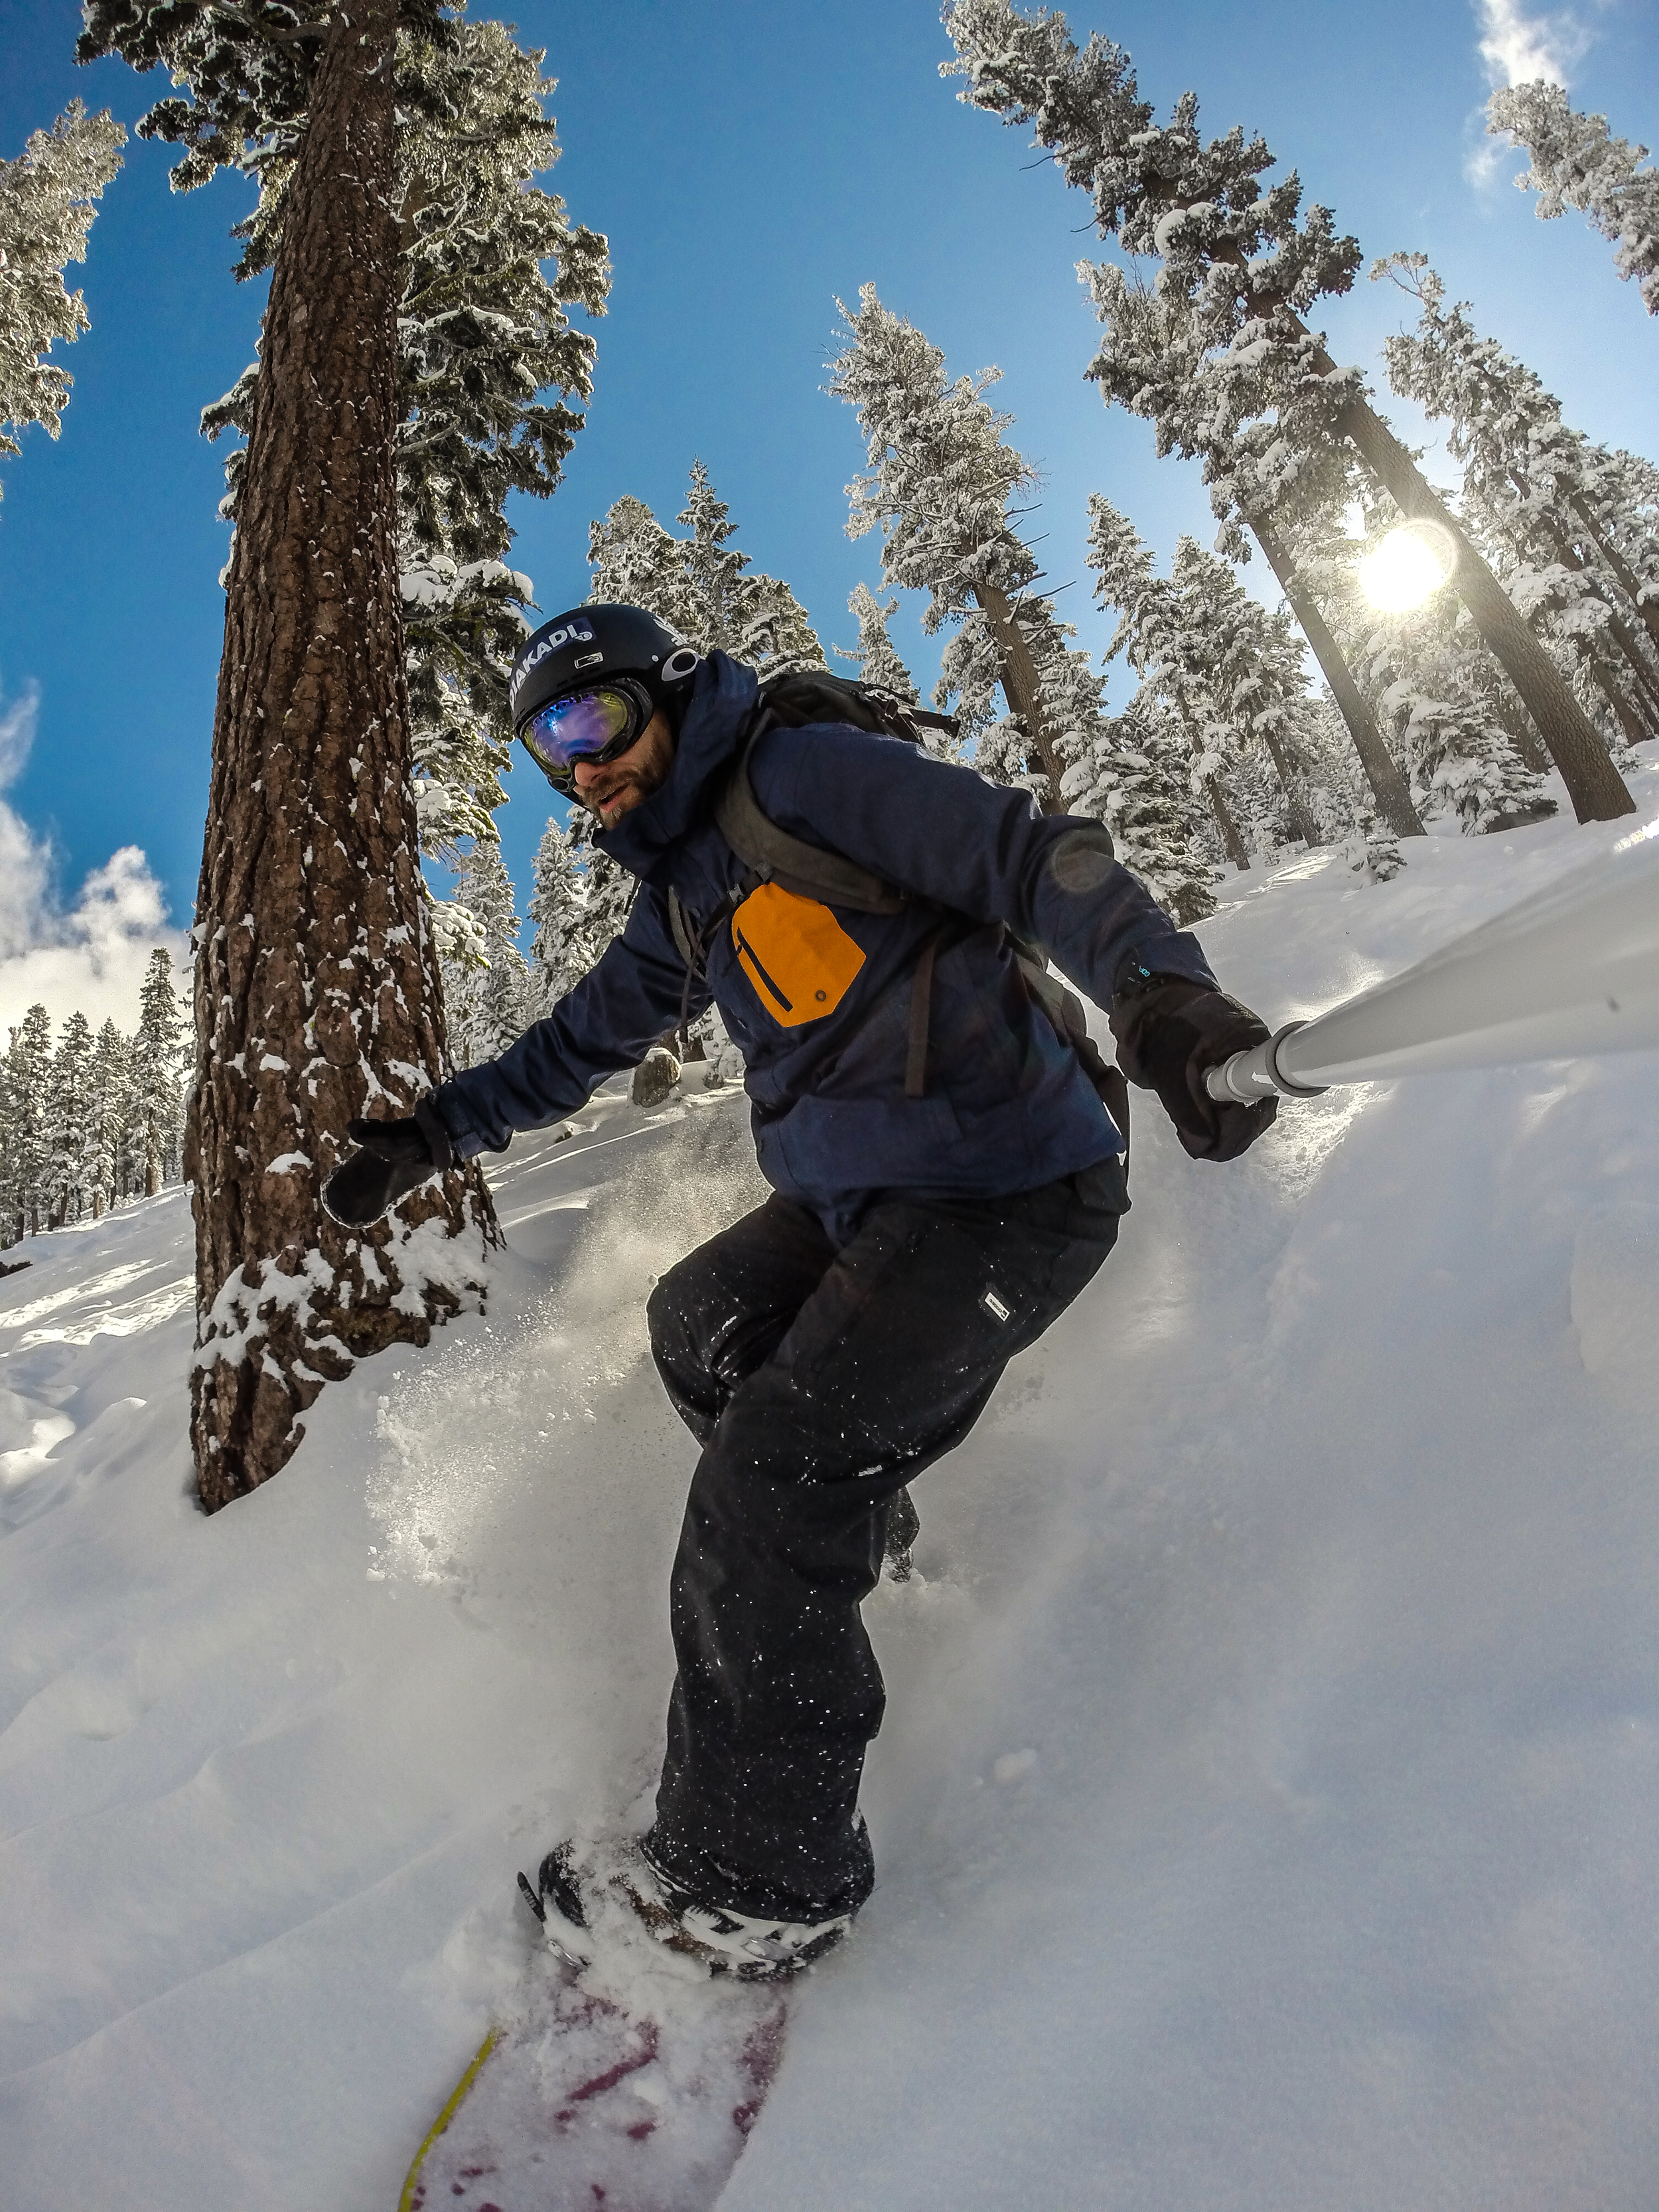 2016 06 Billy Snowboard.jpg